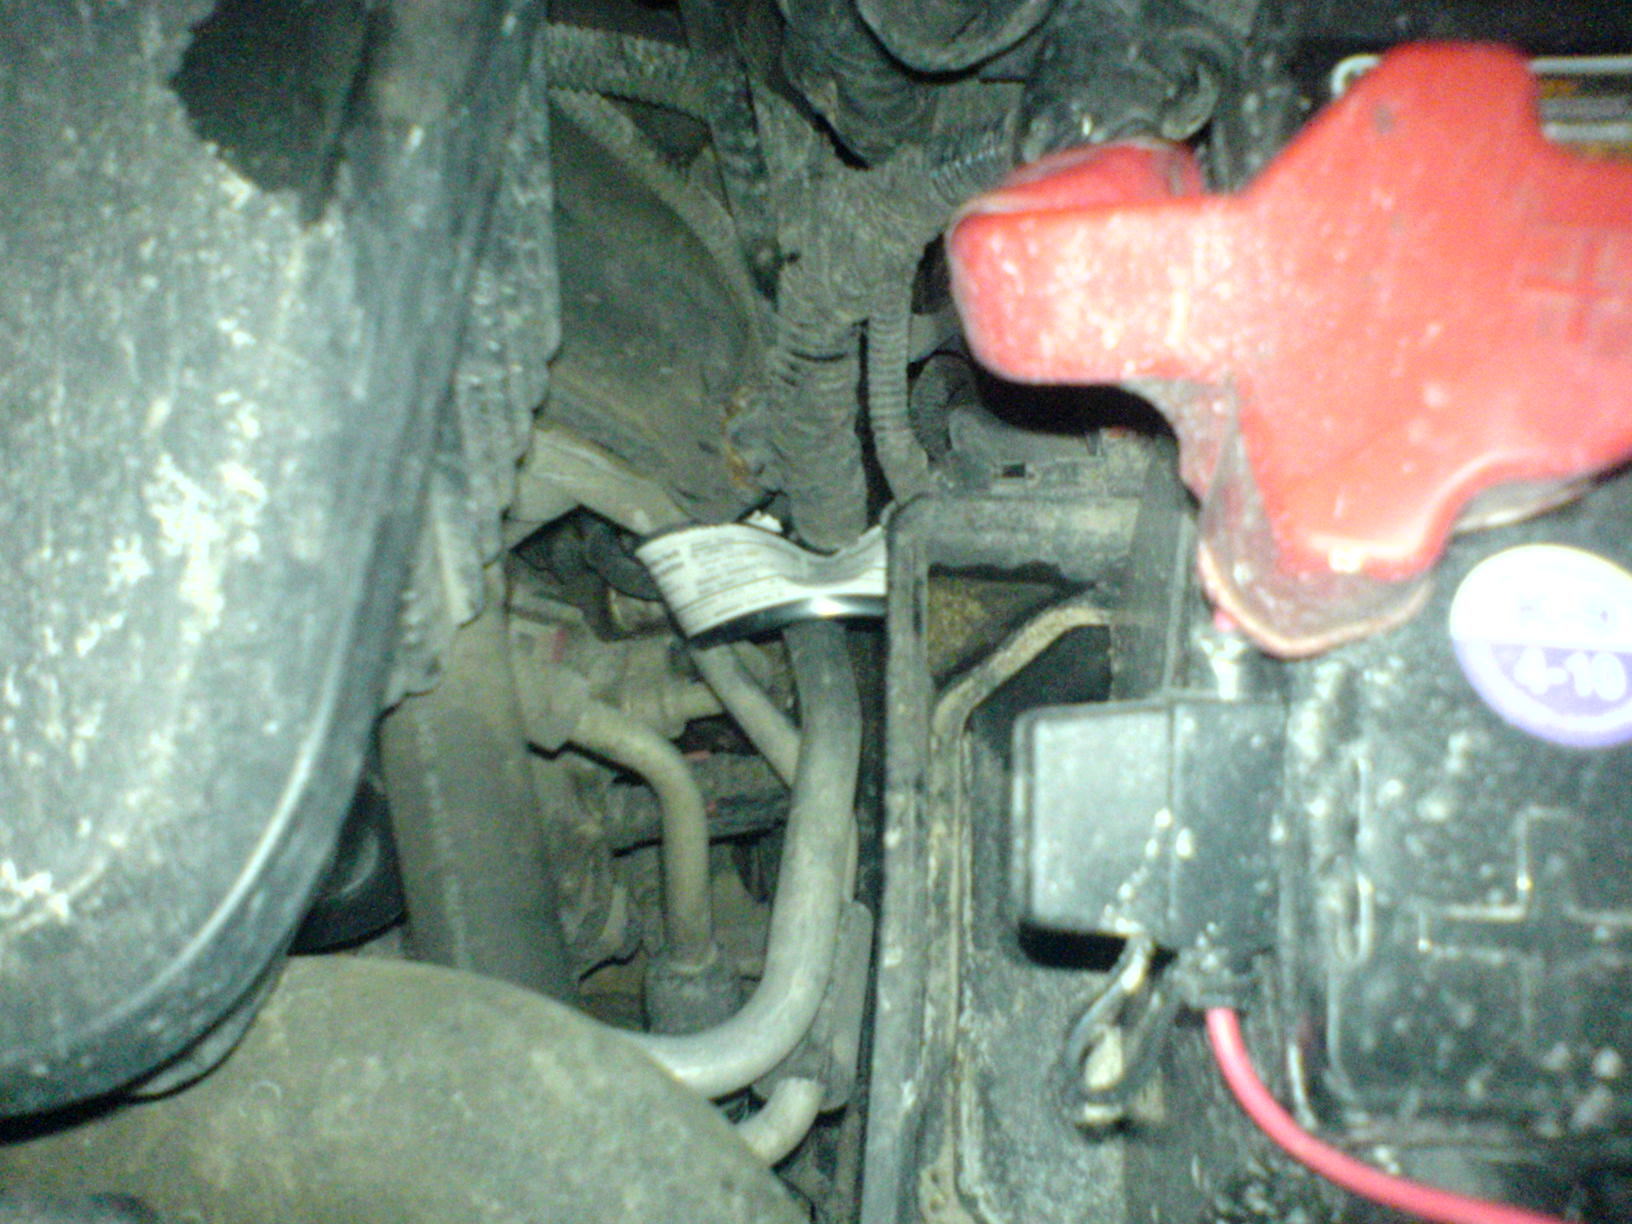 Engine Won't Start...Sometimes - Jeep Commander Forums: Jeep ... on